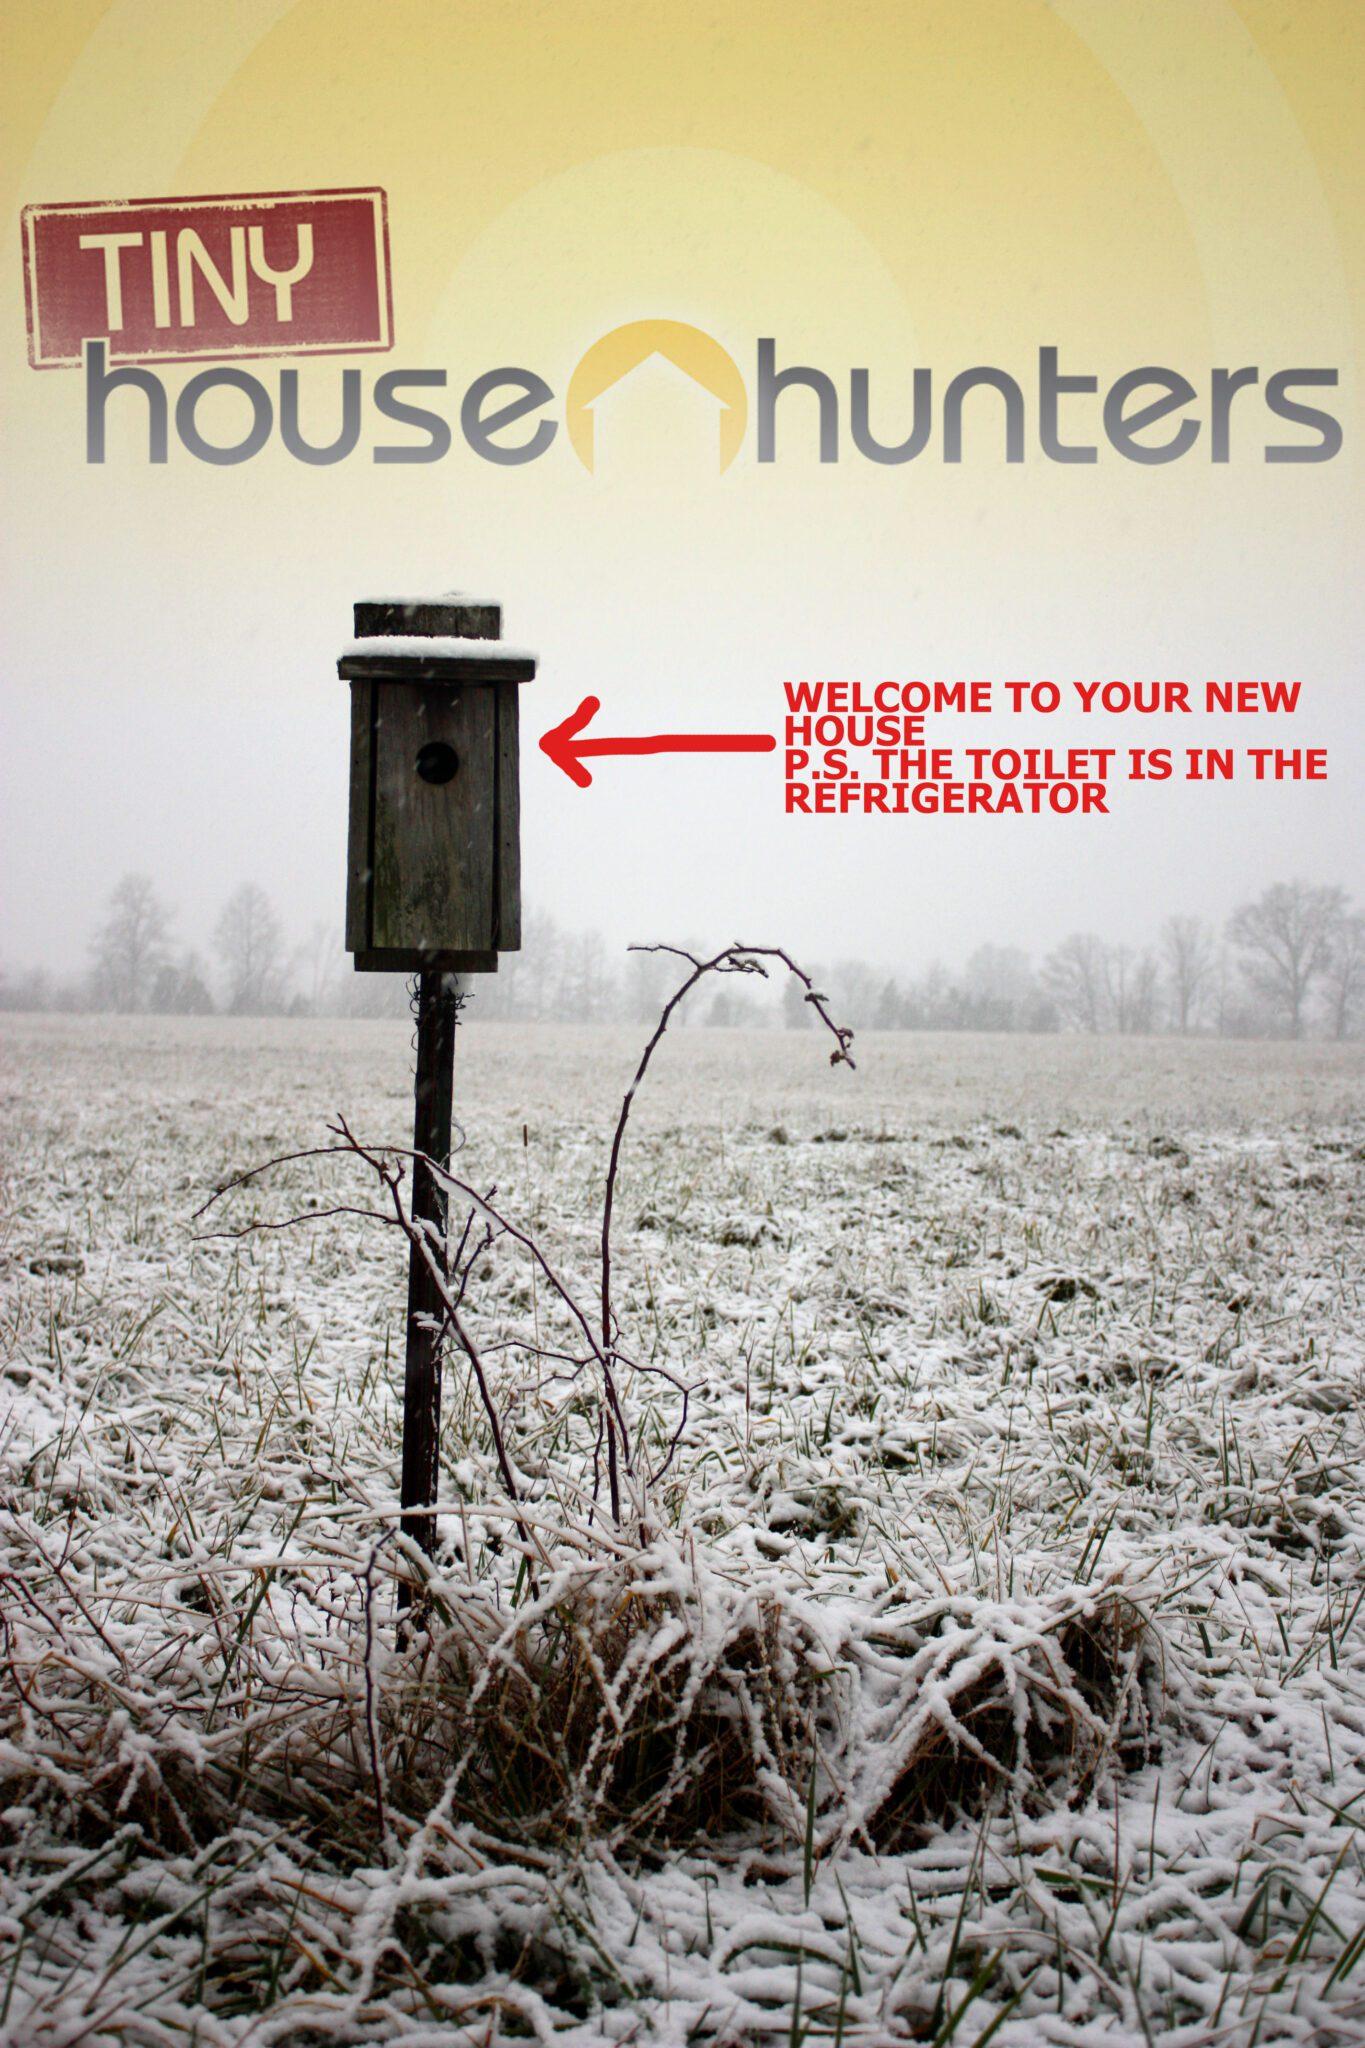 Fullsize Of Tiny House Hunters Full Episodes